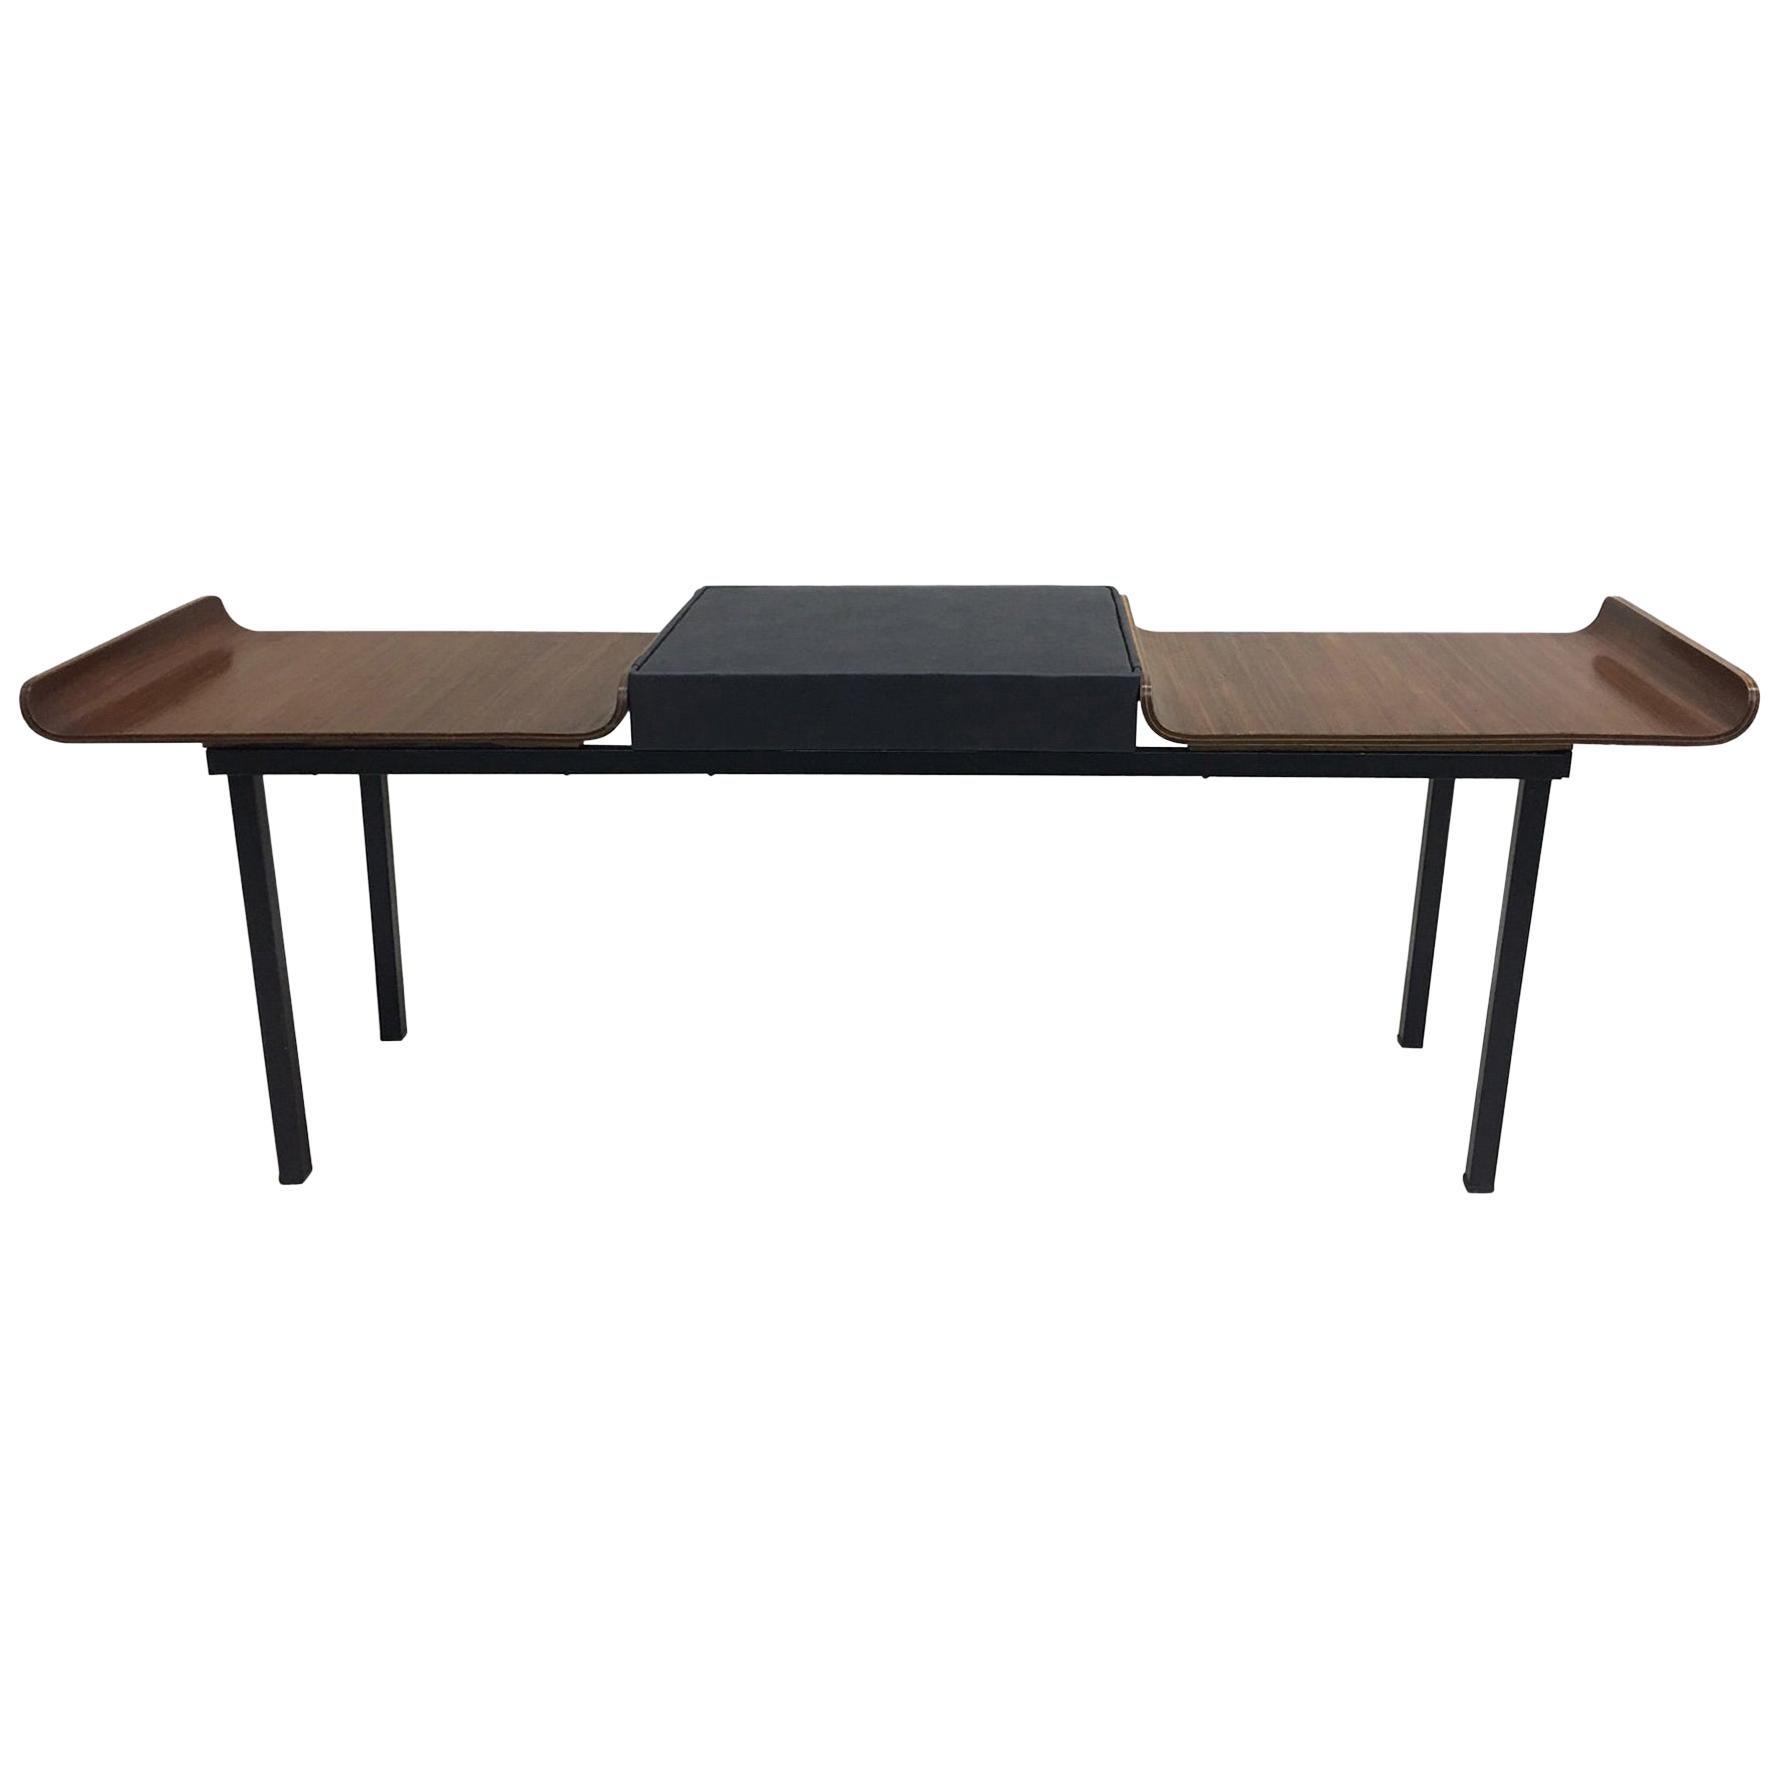 Italian Mid-Century Modern / Minimalist Bench by Franco Campo and Carlo Graffi